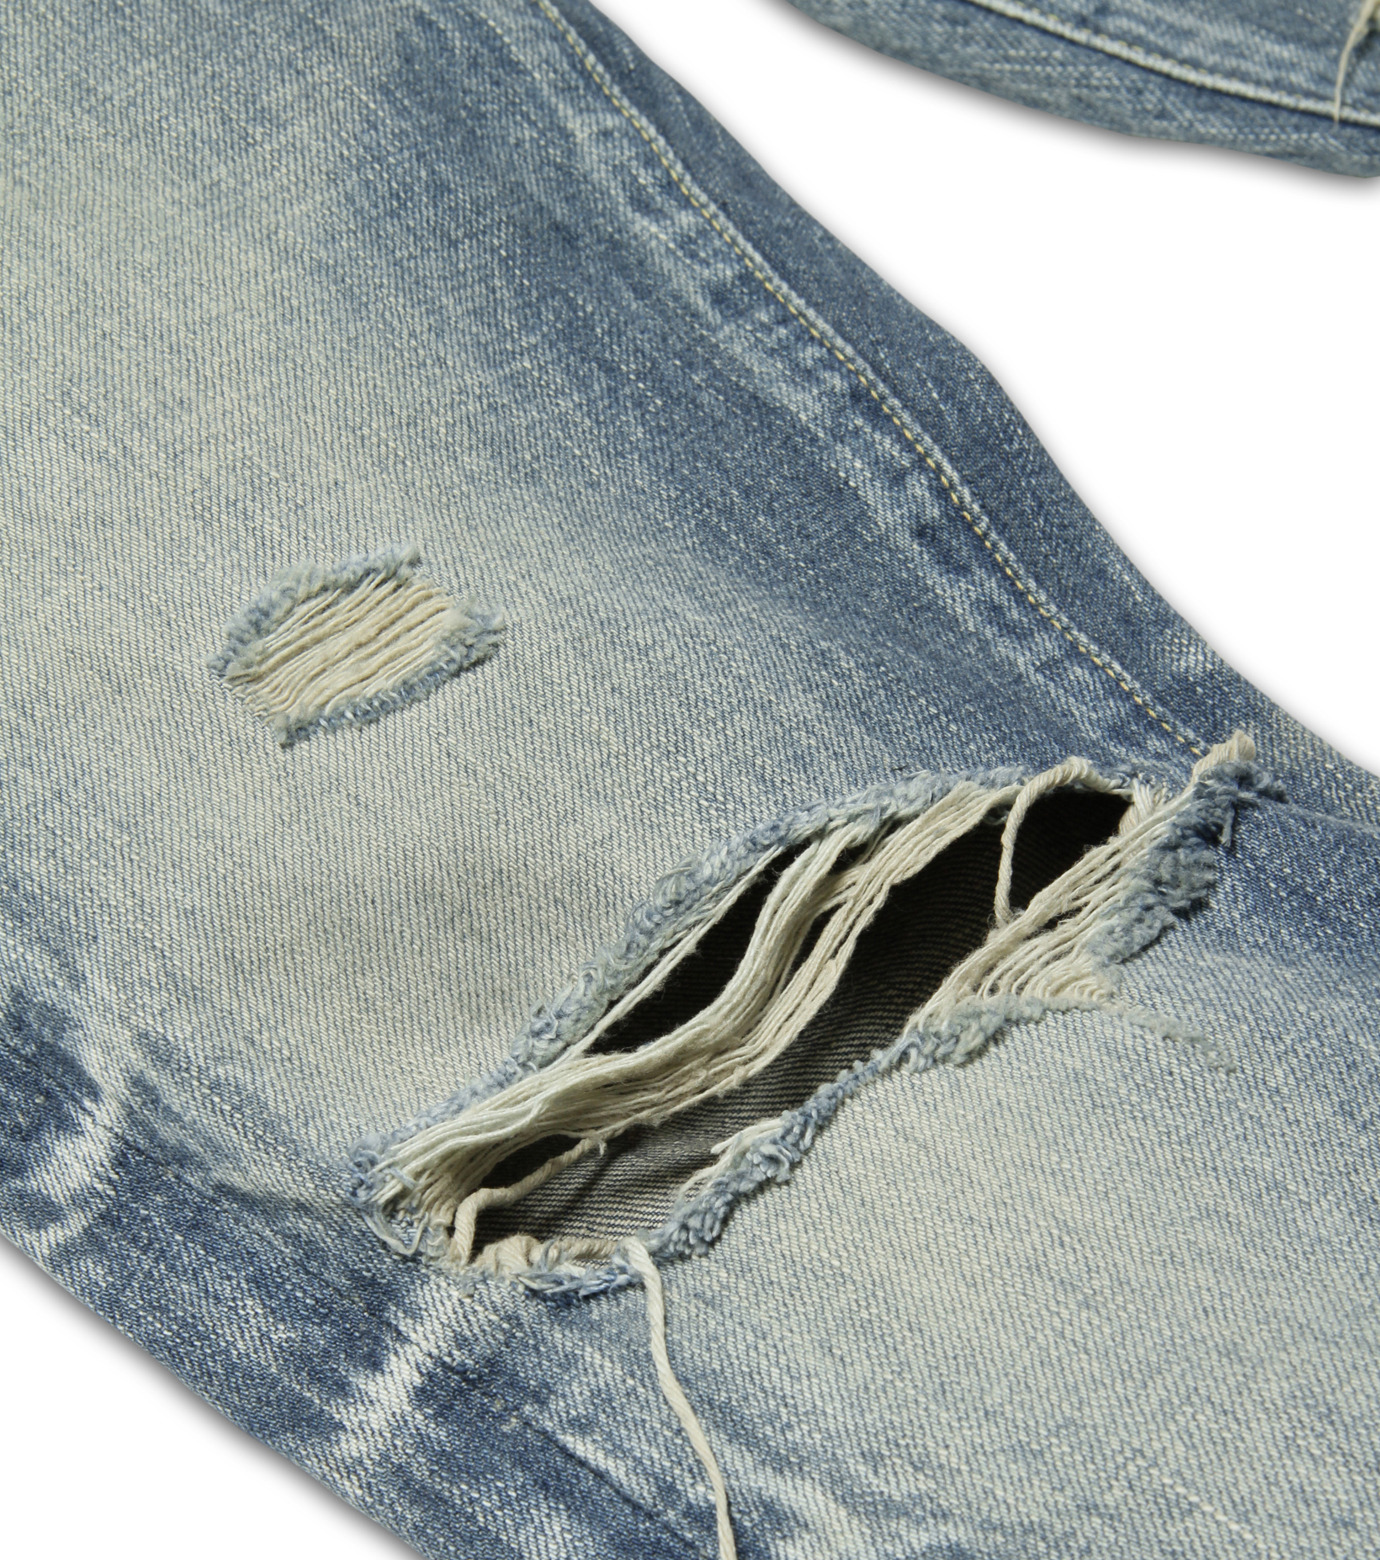 HL HEDDIE LOVU(エイチエル・エディールーヴ)のDamage Denim PT-BLUE(パンツ/pants)-17S98003-92 拡大詳細画像7